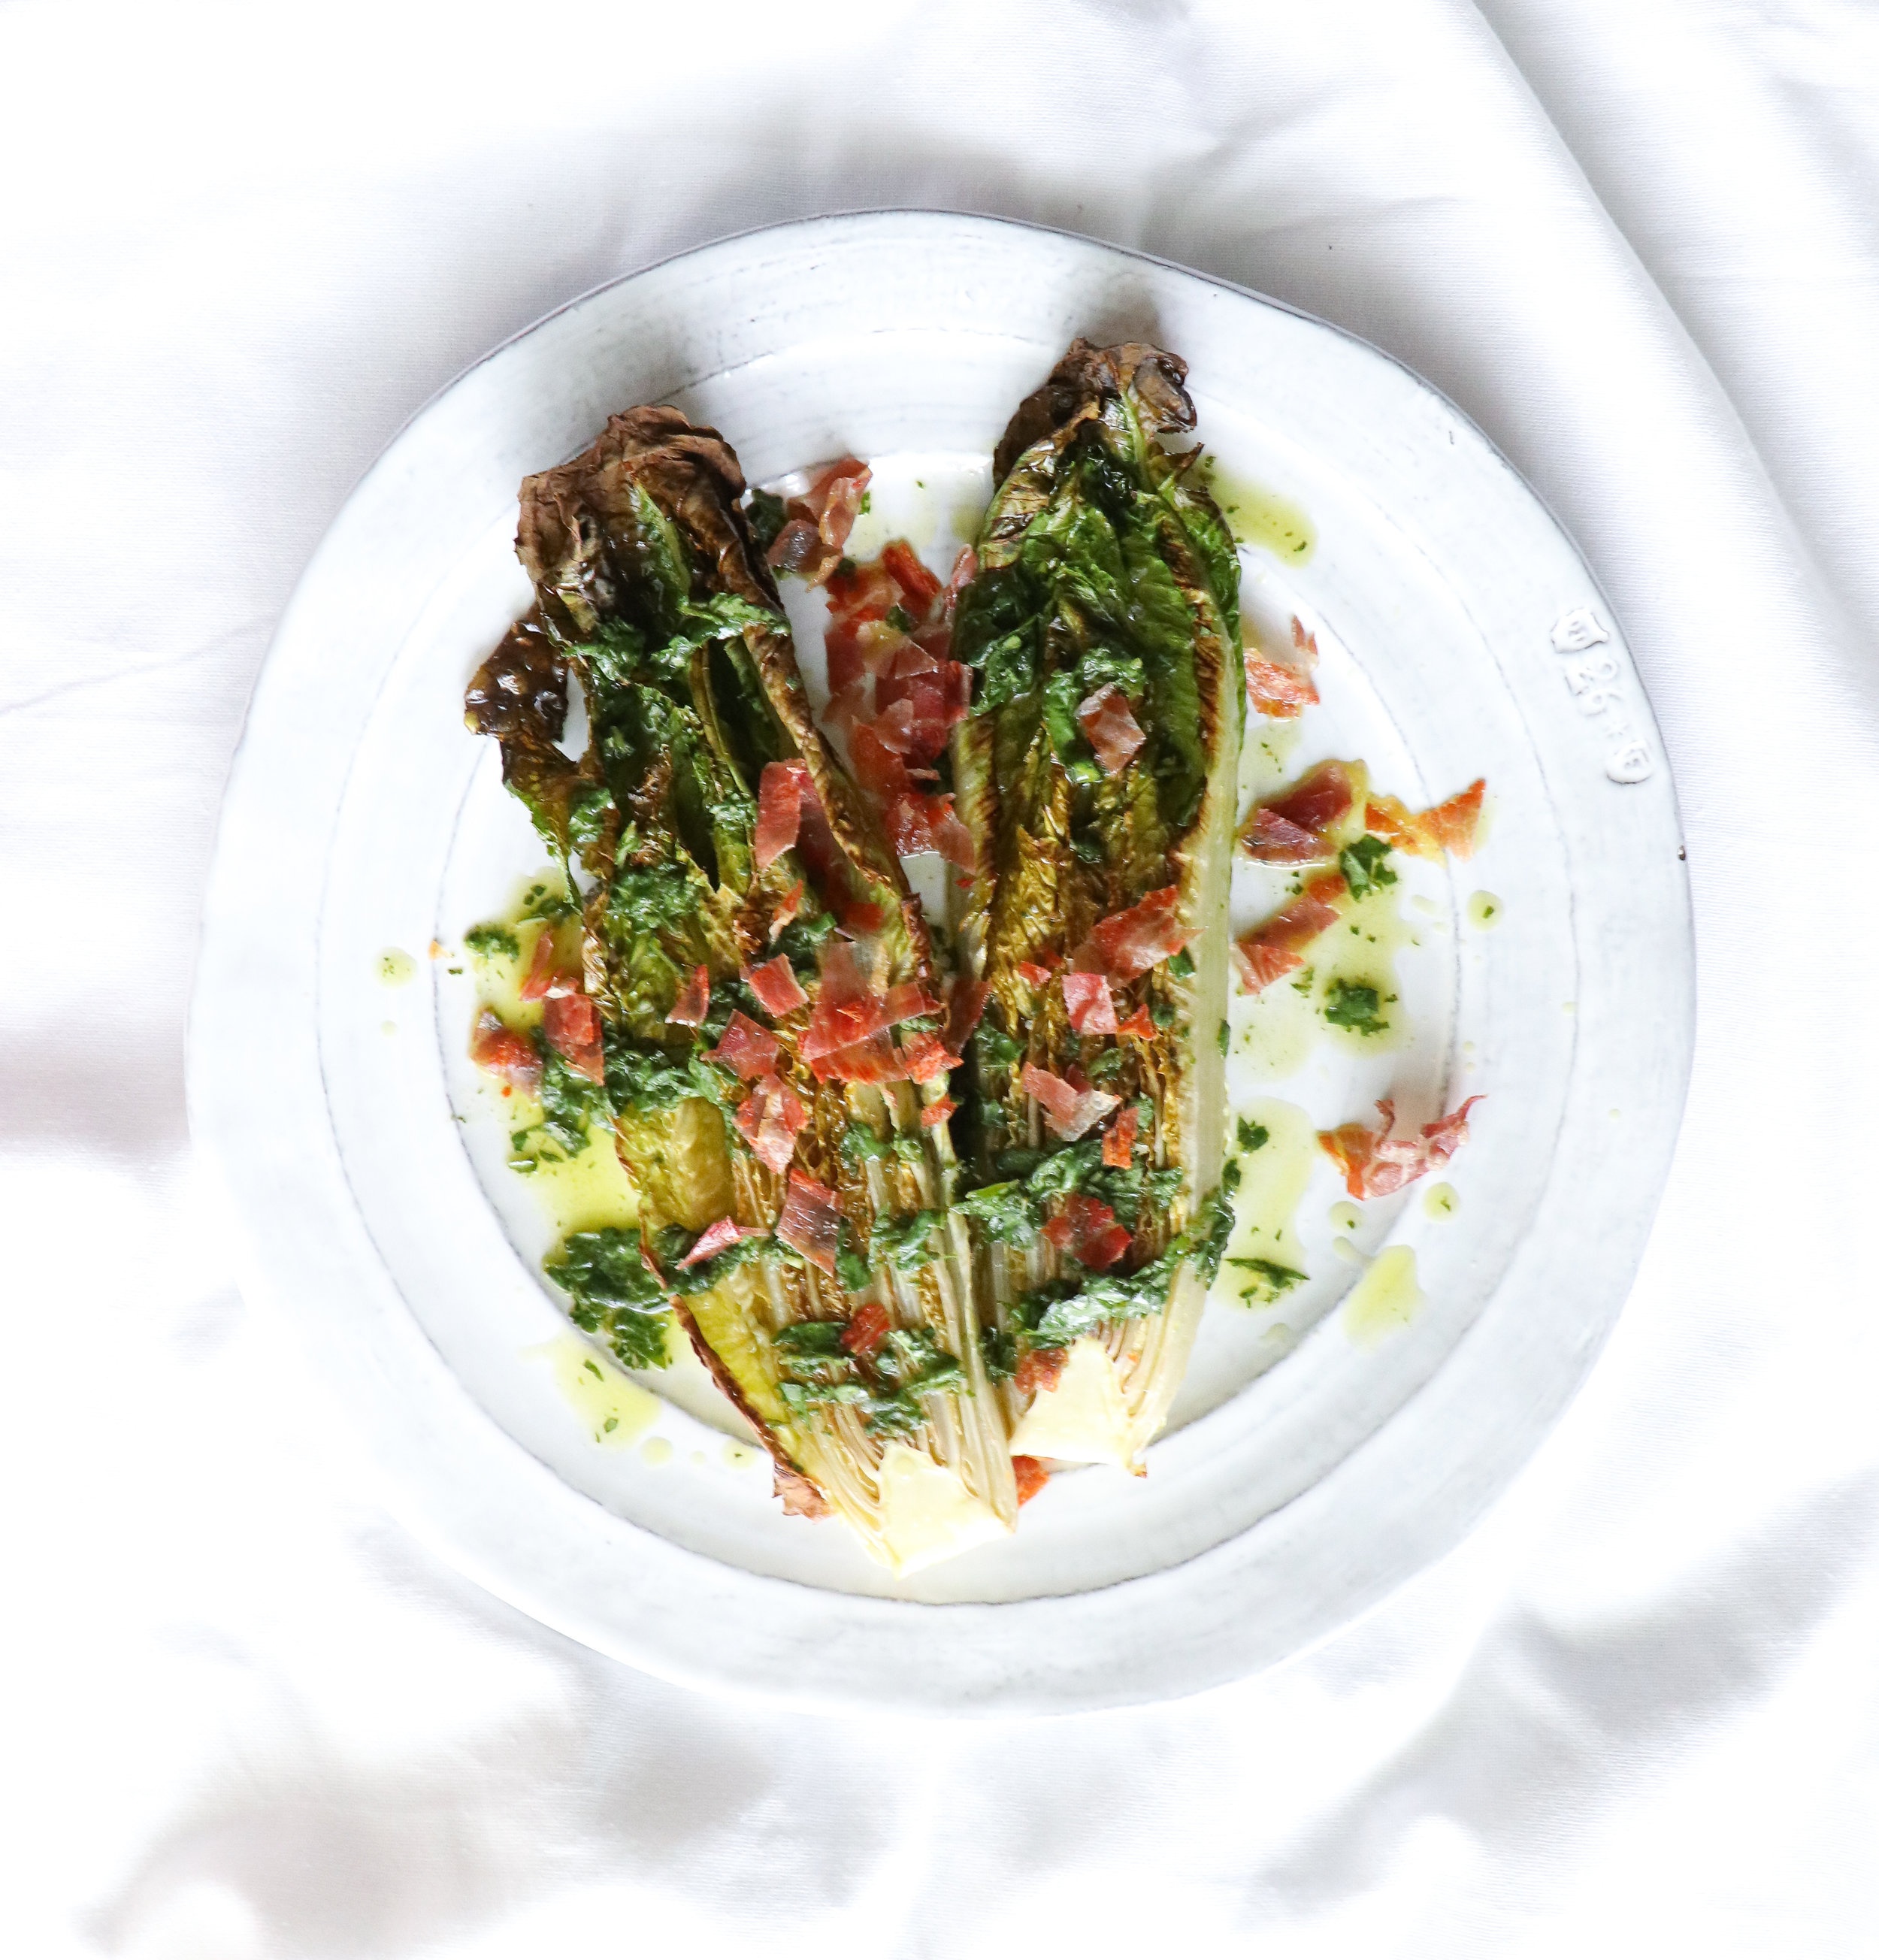 BBQ romaine lettuce top 8 allergen free